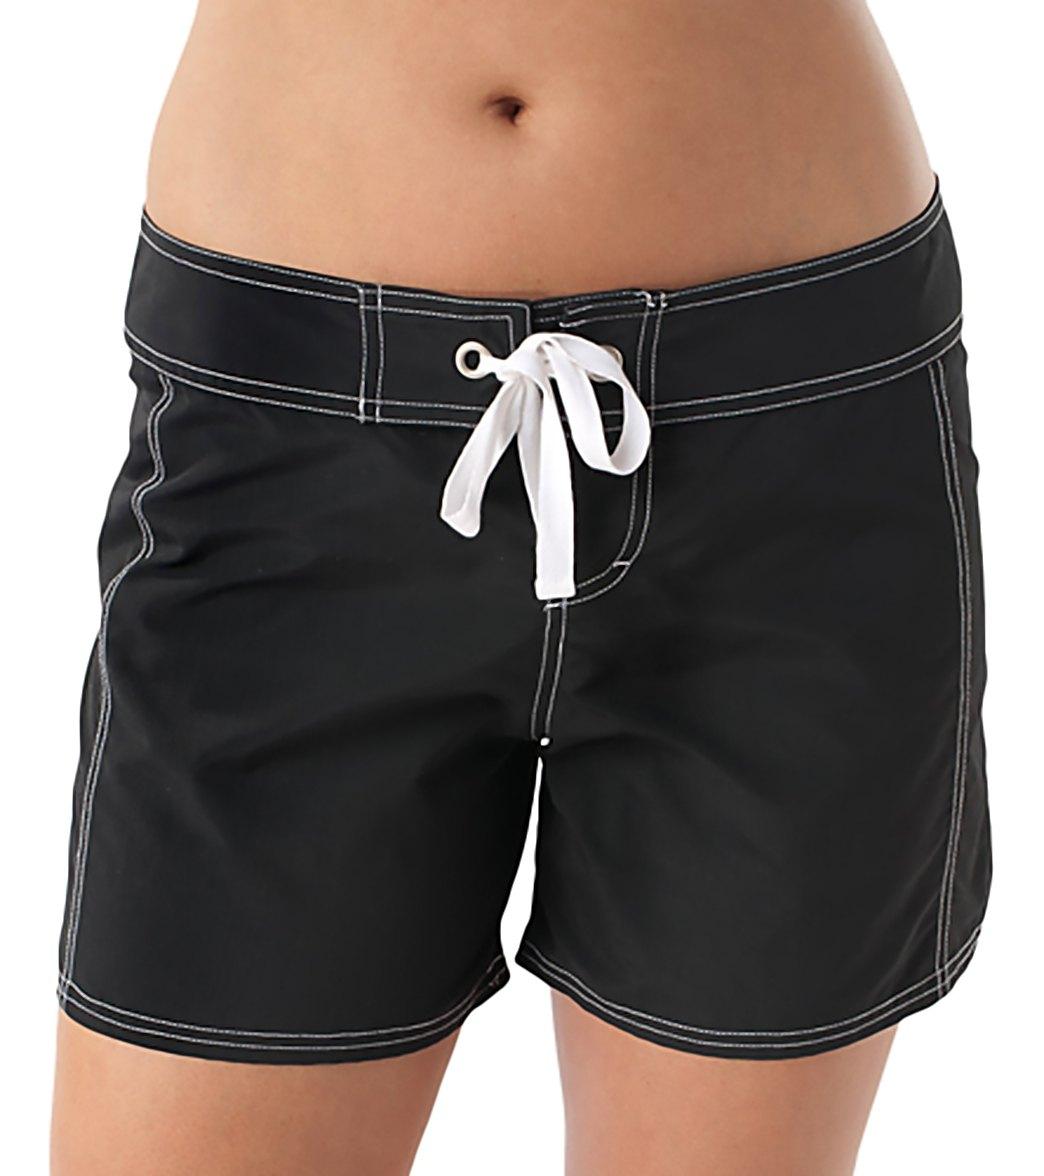 board shorts for women tommy bahama womenu0027s 5 ZABXFHR